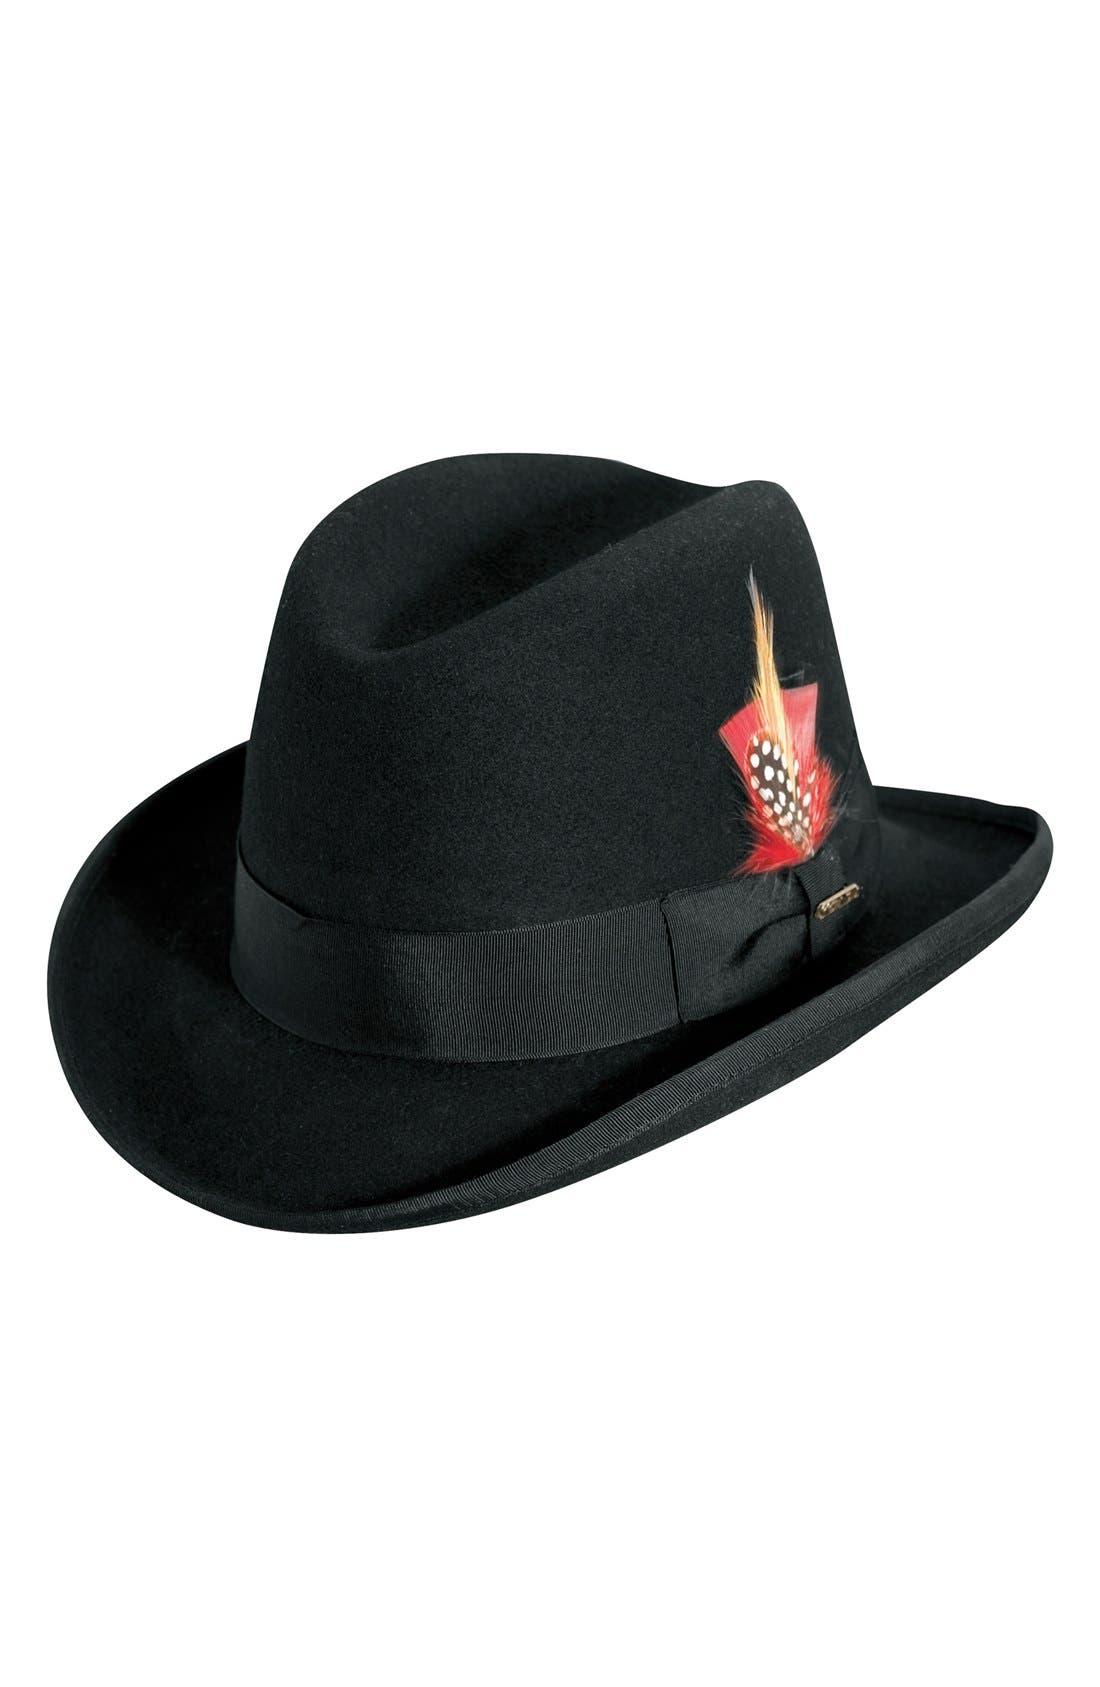 Wool Homburg Hat,                         Main,                         color, Black